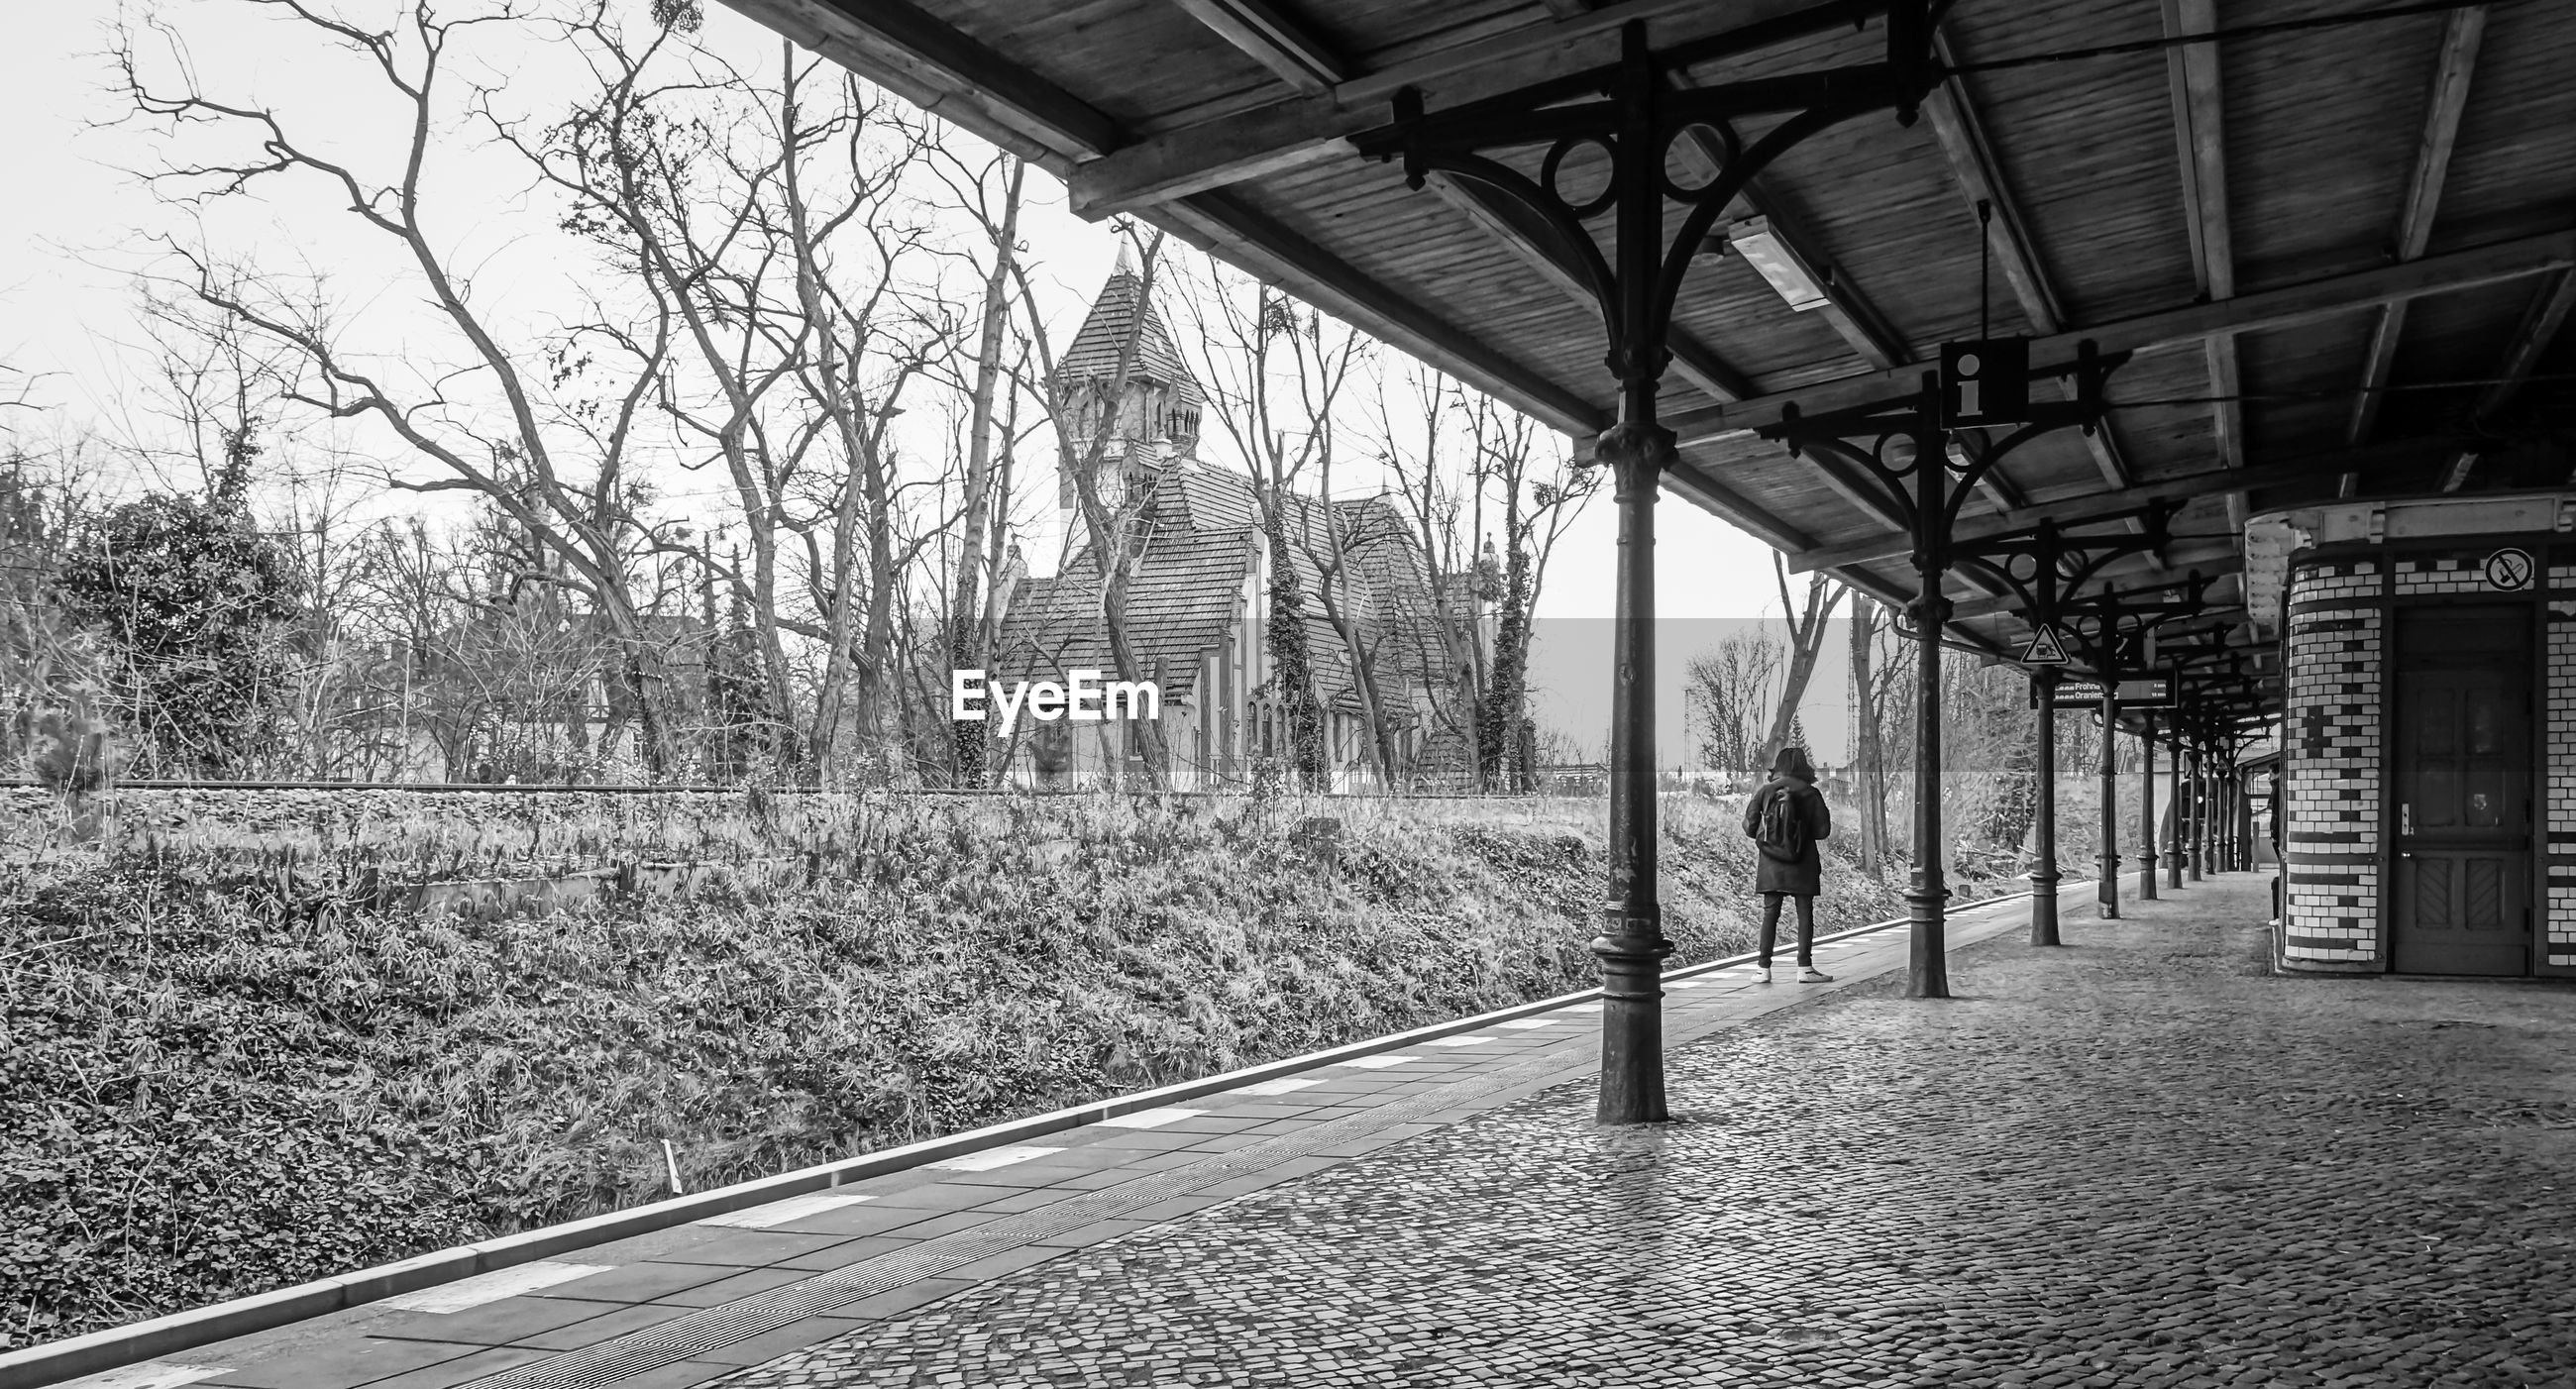 Woman standing at railroad station platform